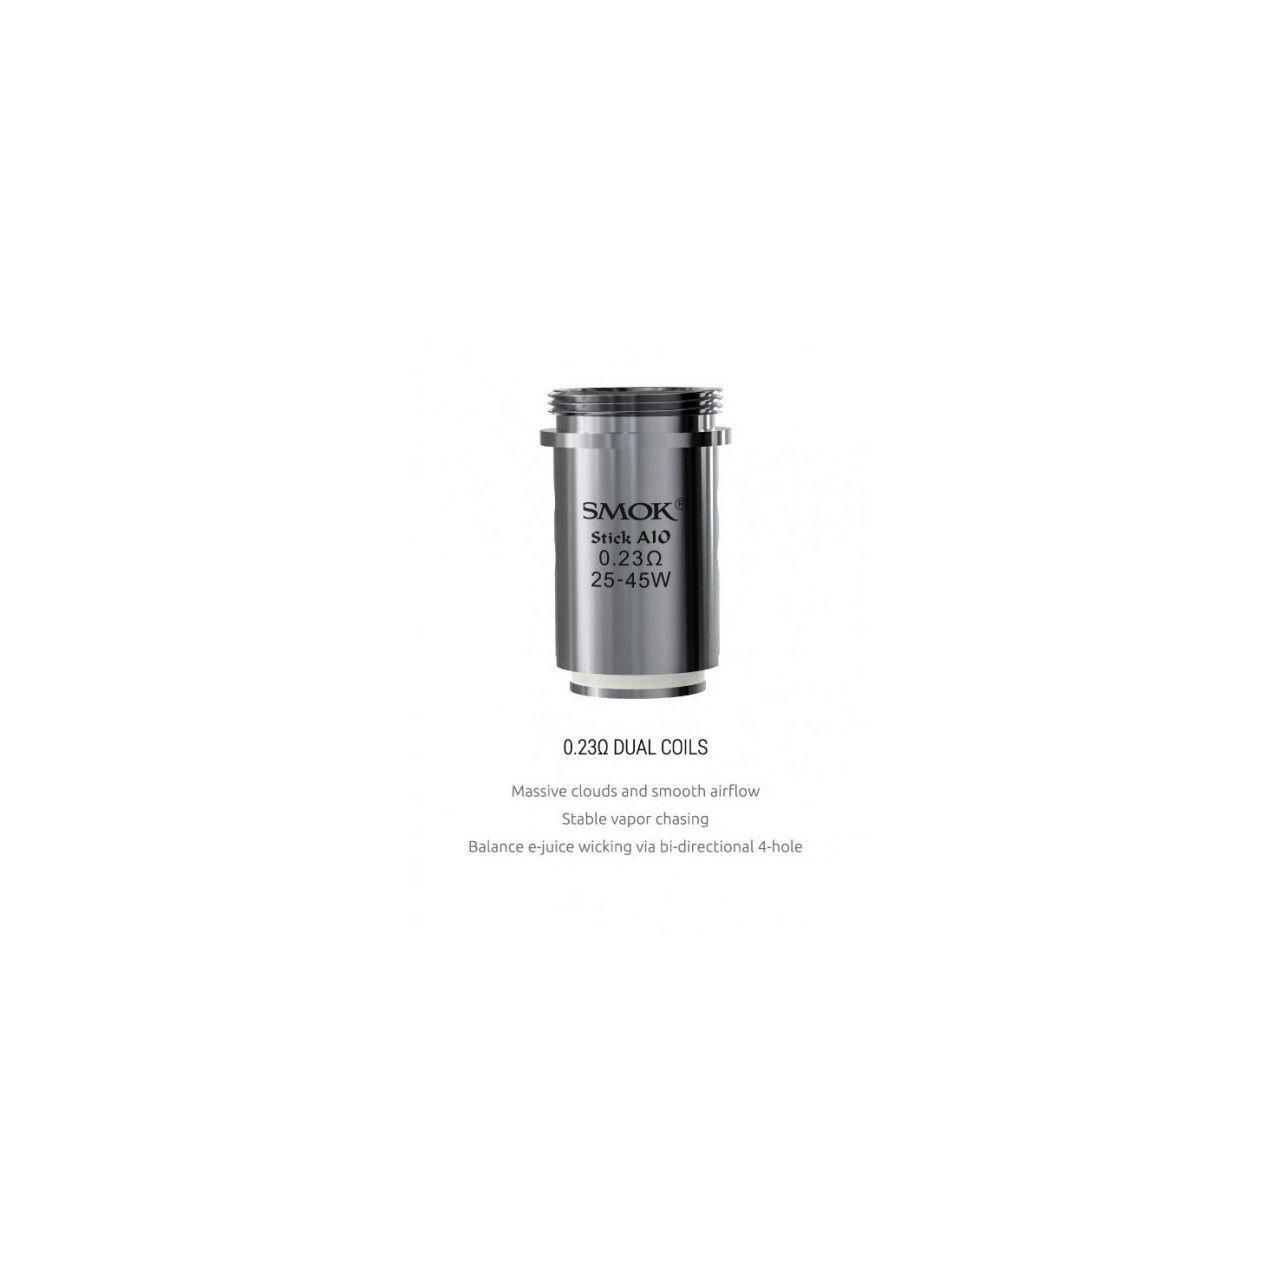 Coil Smok Stick Aio 0.23 ohm p/ Stick Aio e Priv One Kit